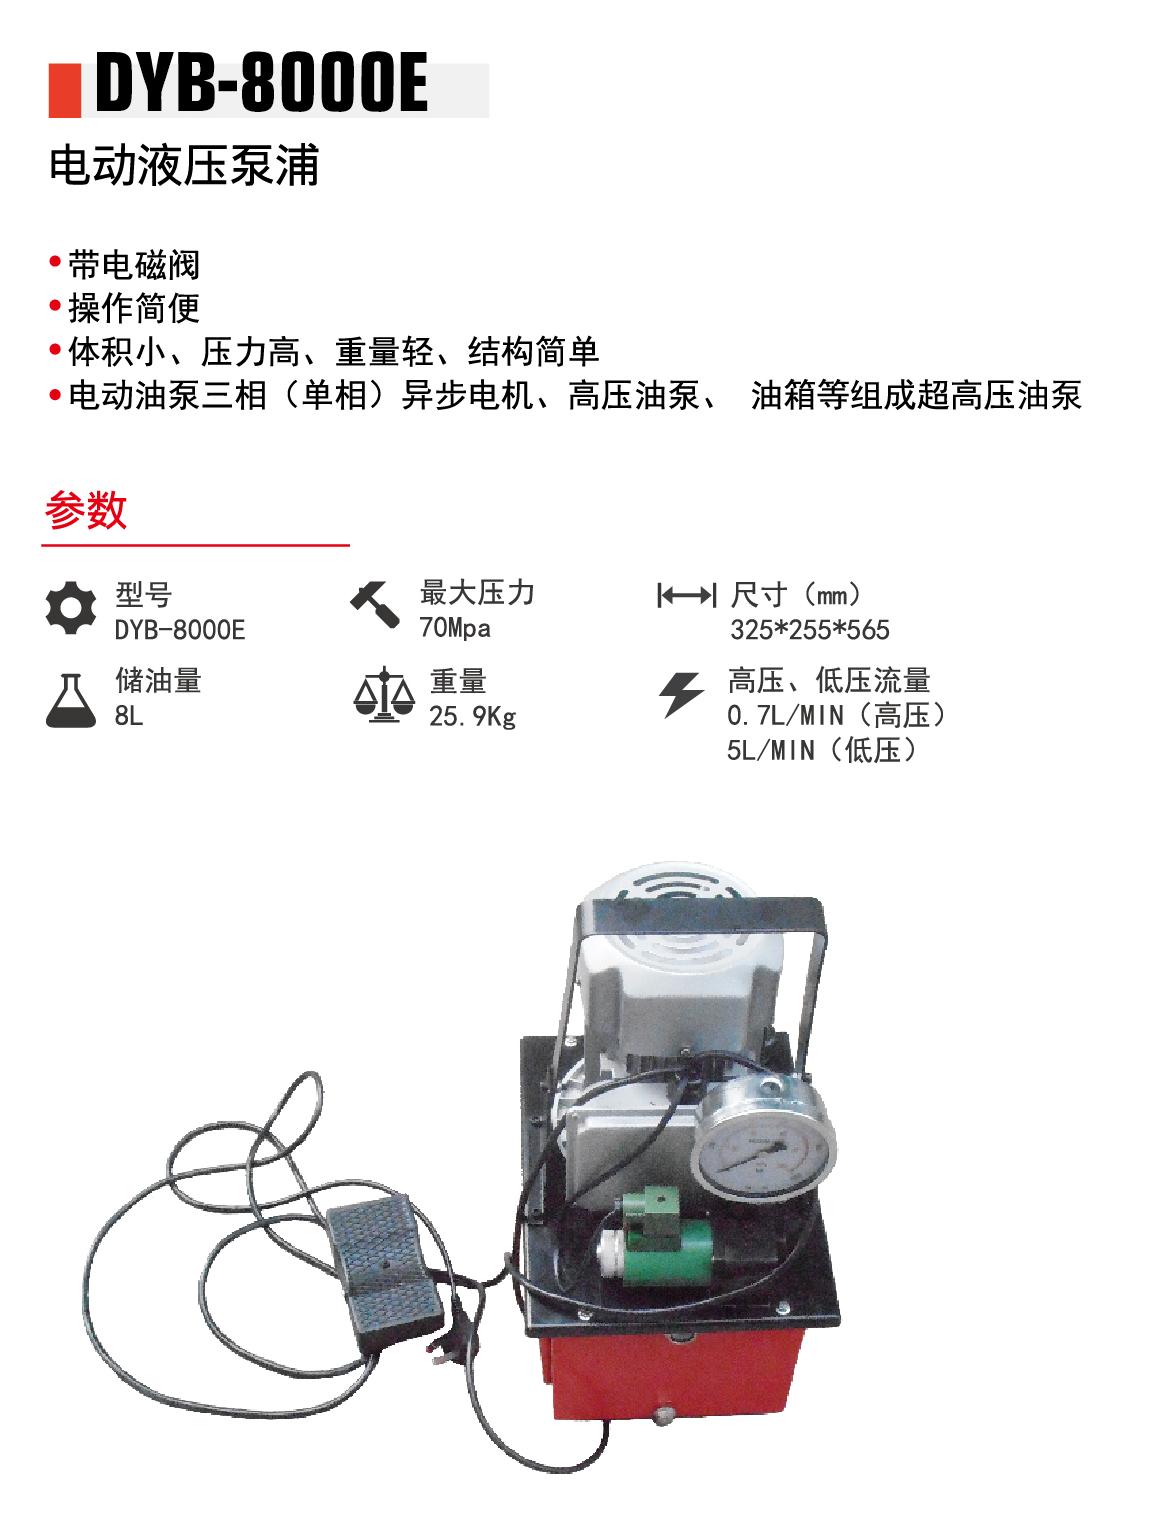 DYB-8000E.png